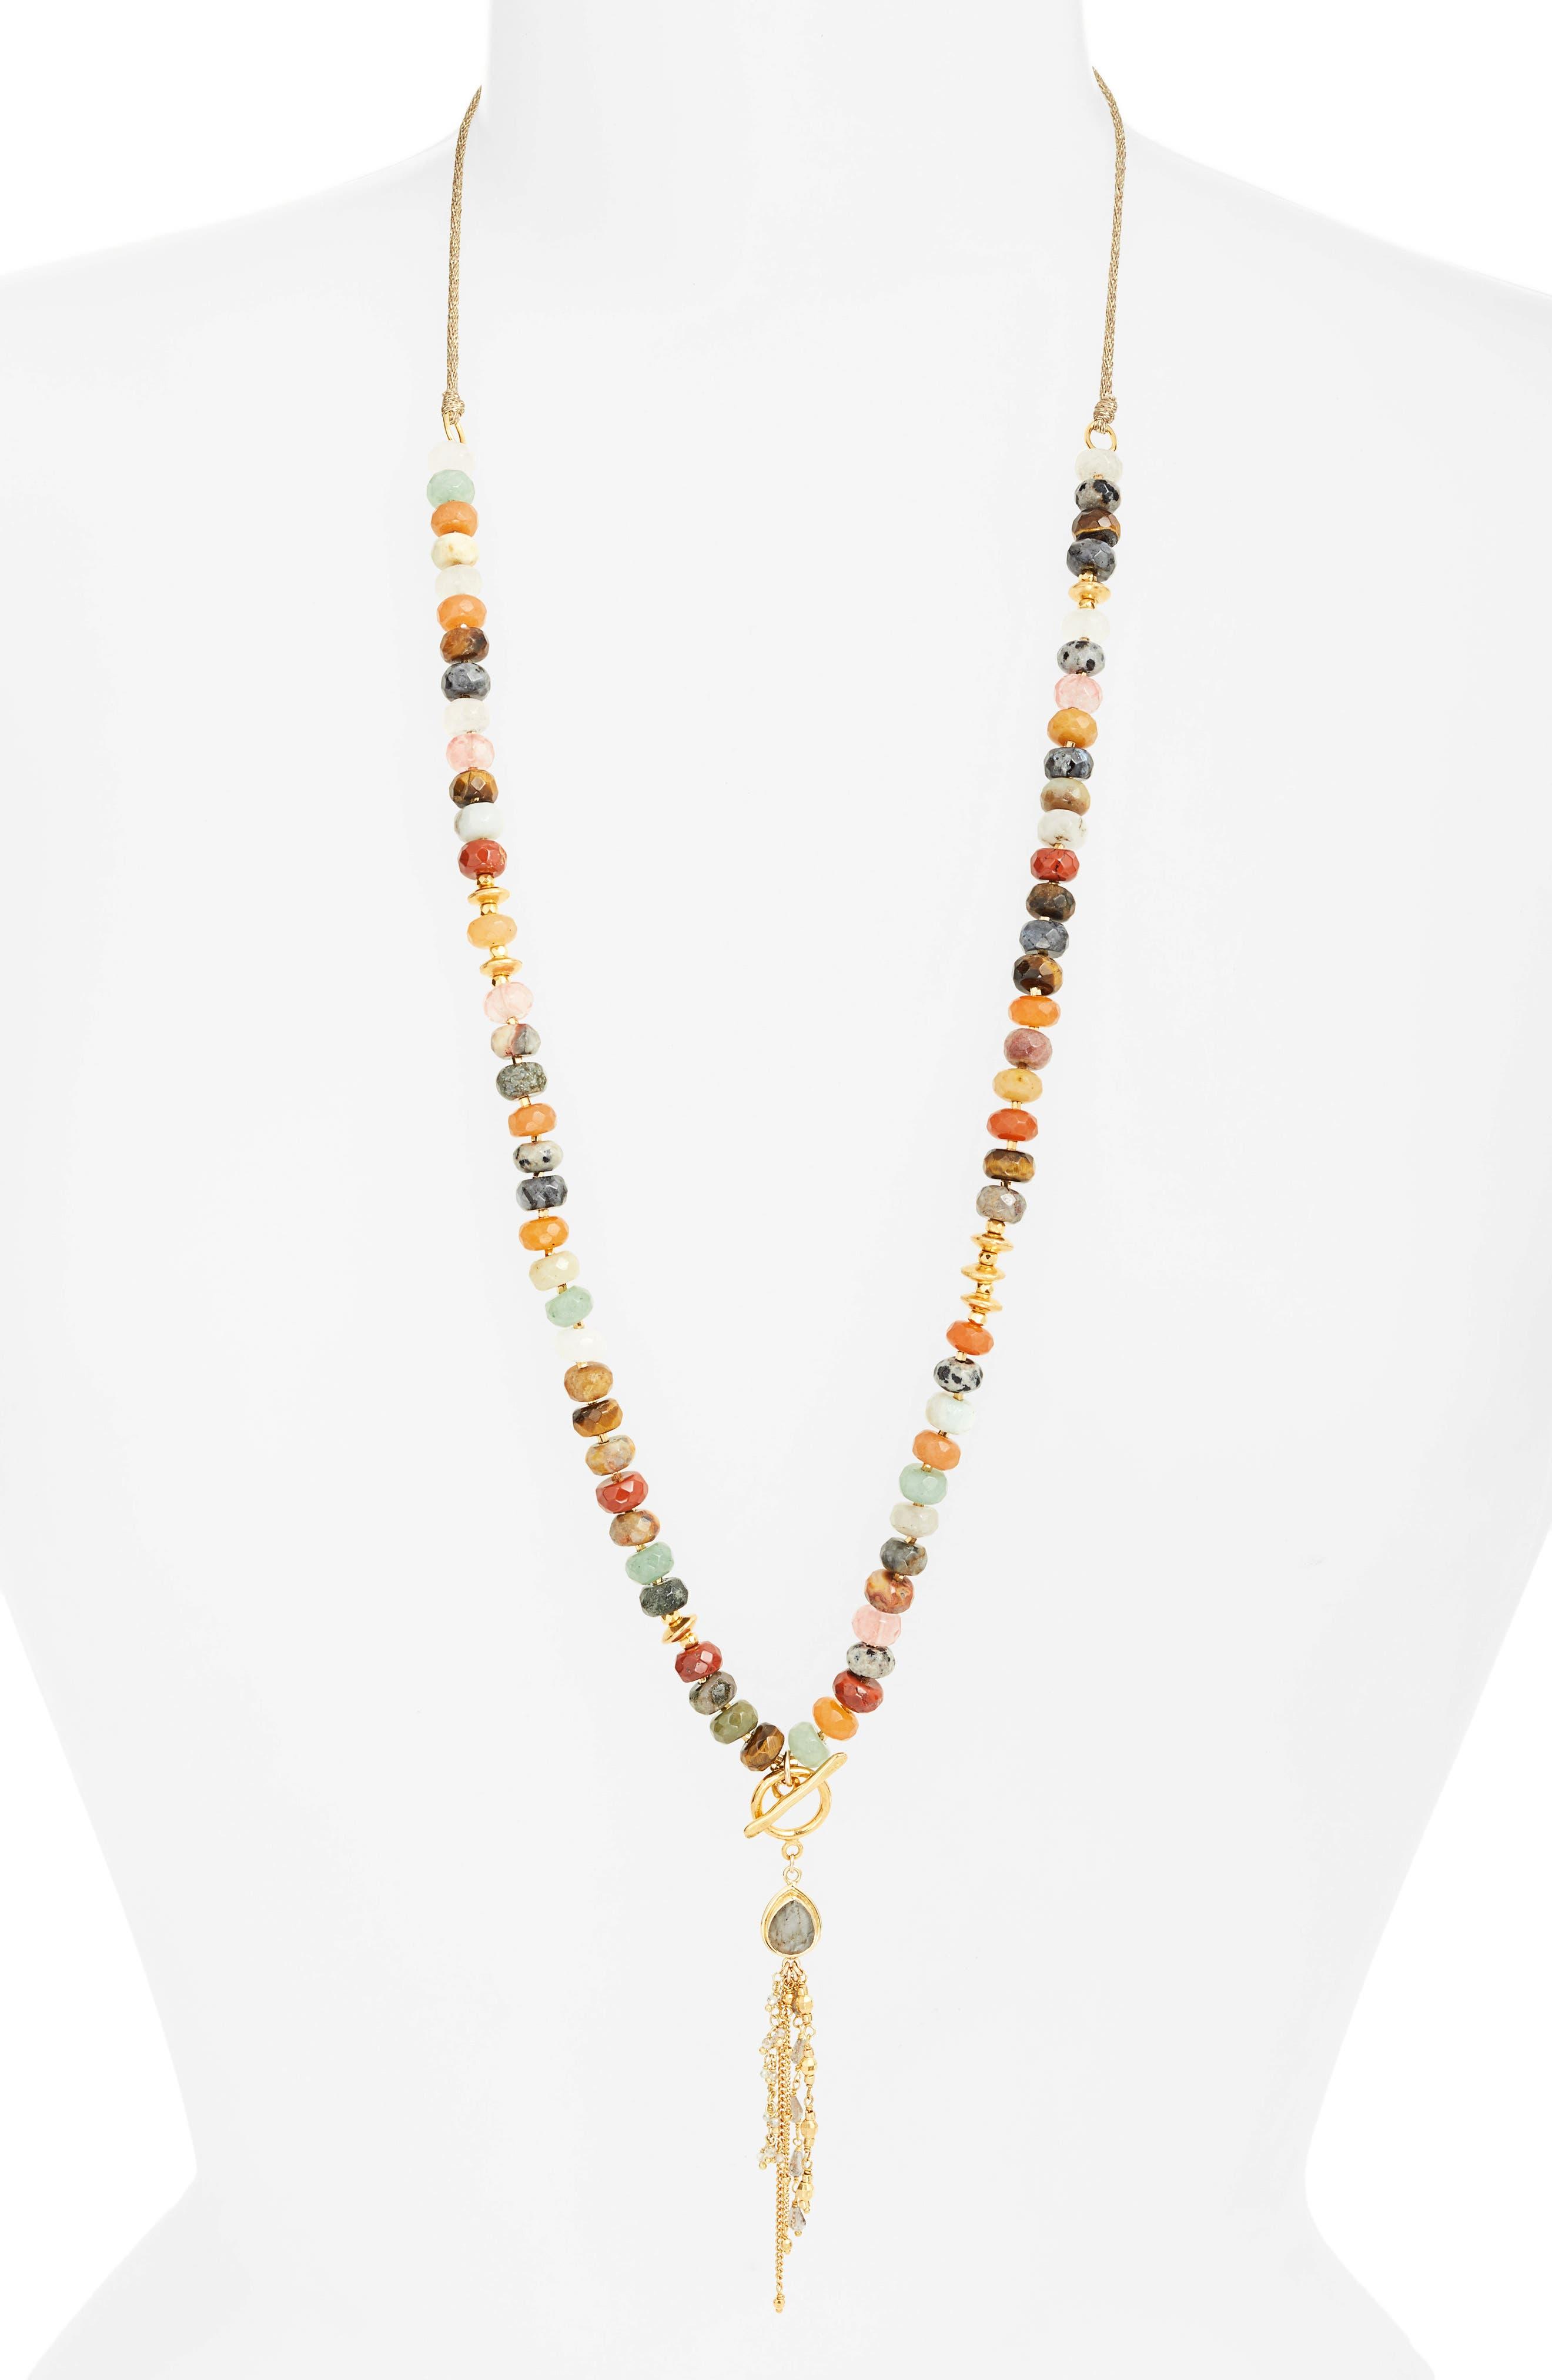 Adjustable Tassel Necklace,                             Main thumbnail 1, color,                             200